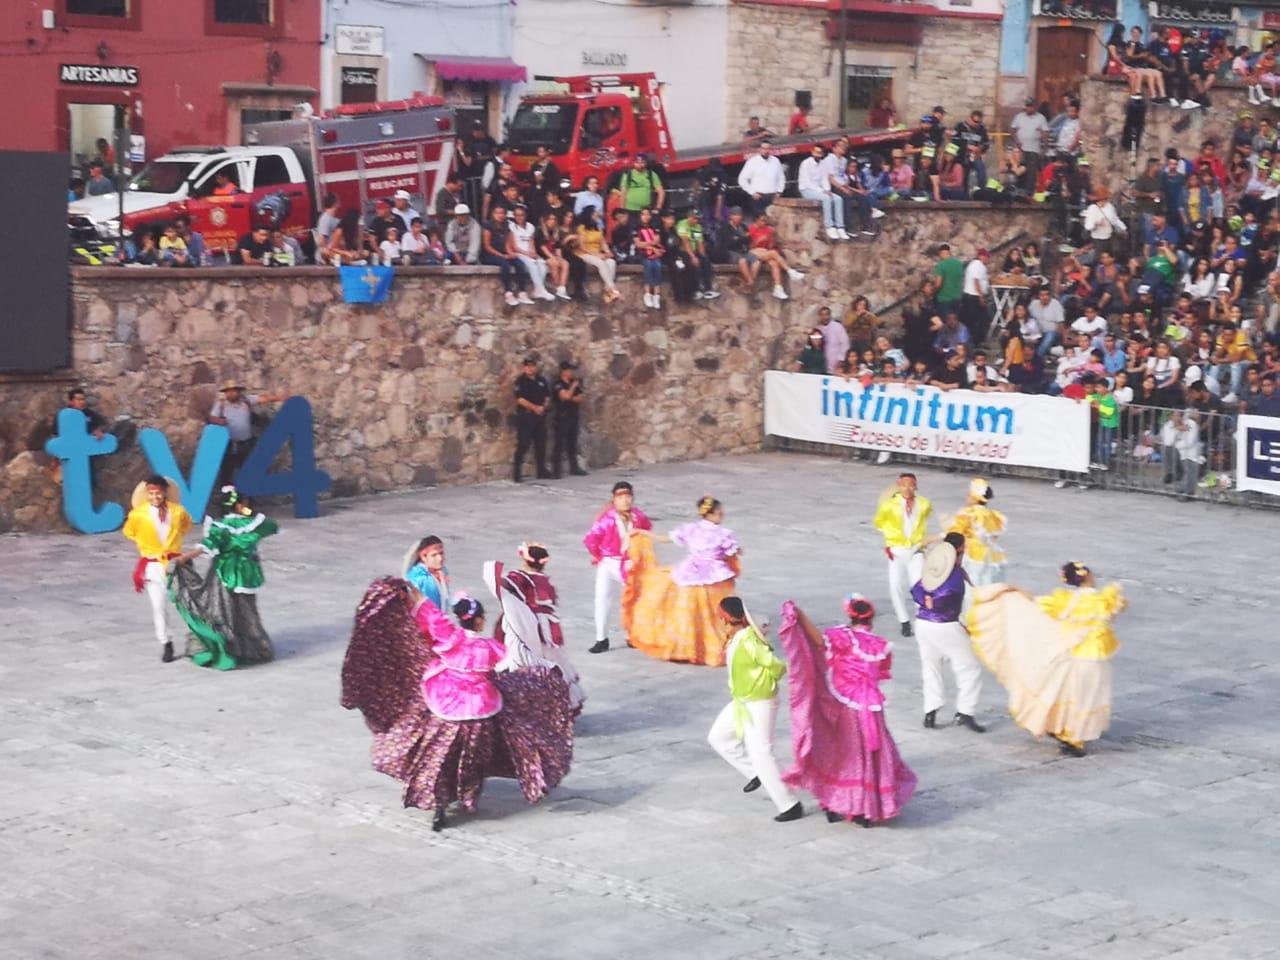 WRC: 17º Rallye Guanajuato Corona - México [12-15 Marzo] - Página 2 ES9AHCAWAAAPEiQ?format=jpg&name=large